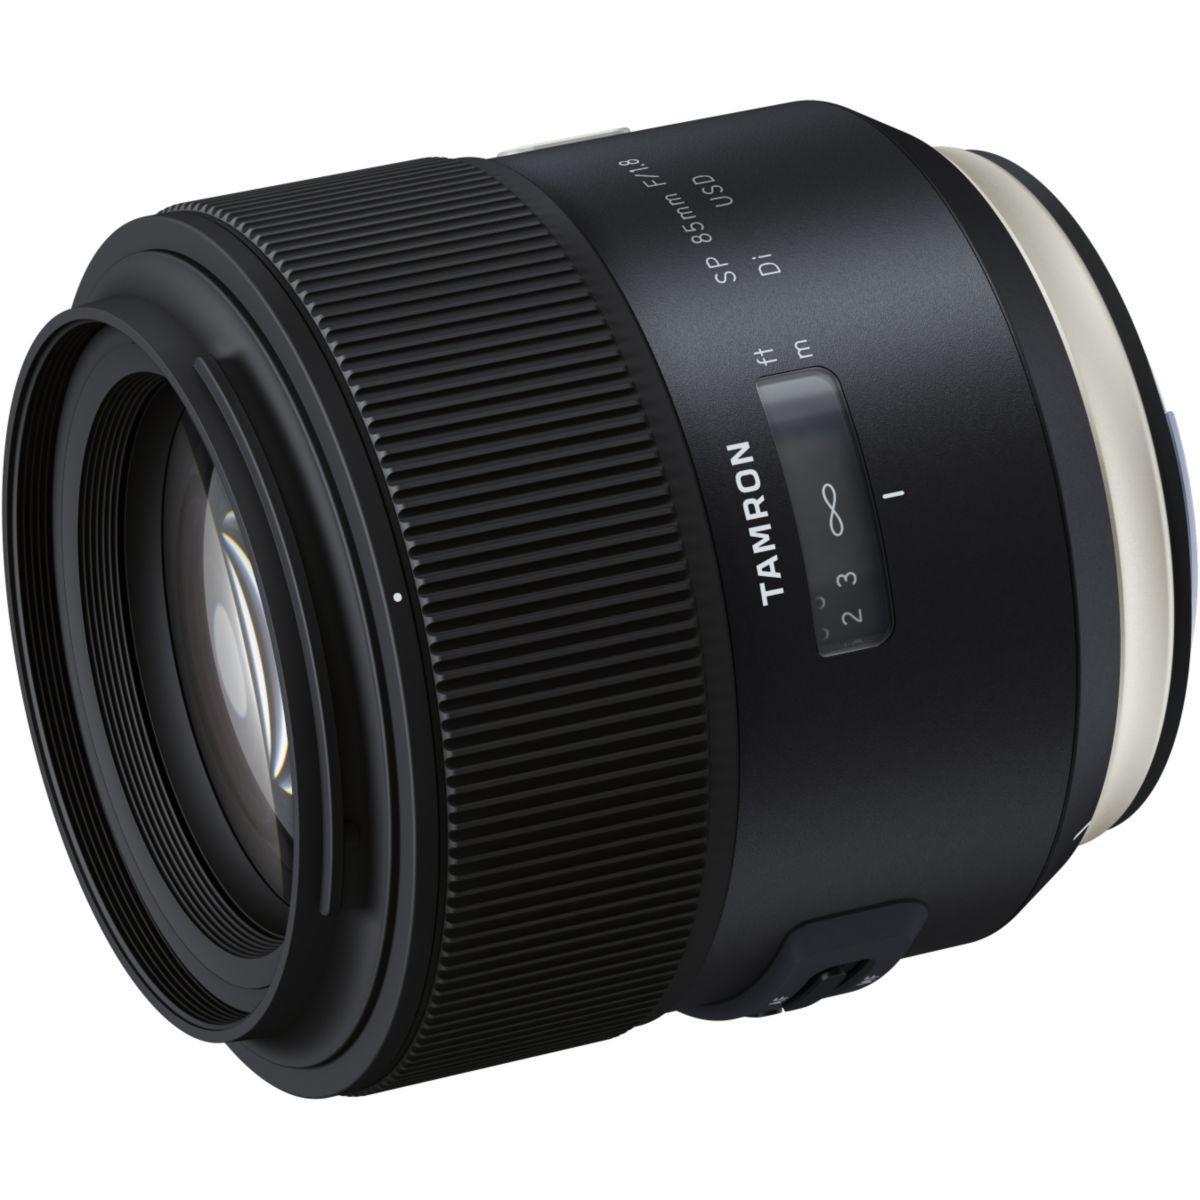 Objectif pour reflex tamron sp 85mm f/1,8 di usd sony - livrai...